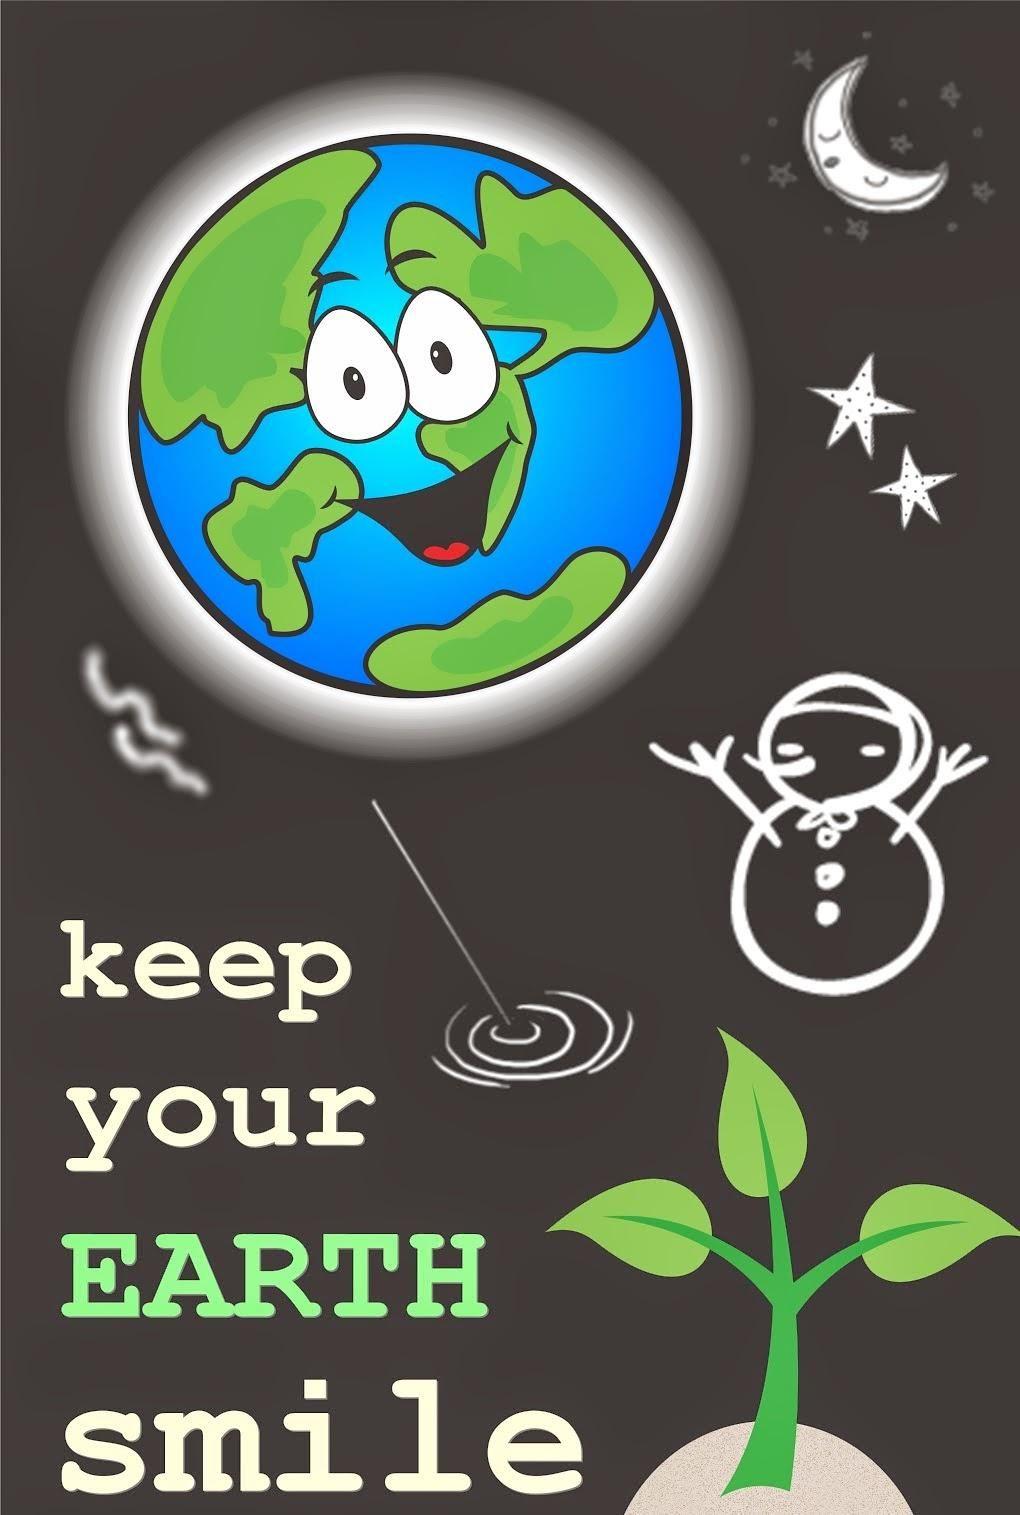 Unduh 92+ Gambar Poster Lingkungan Hidup Paling Bagus Gratis